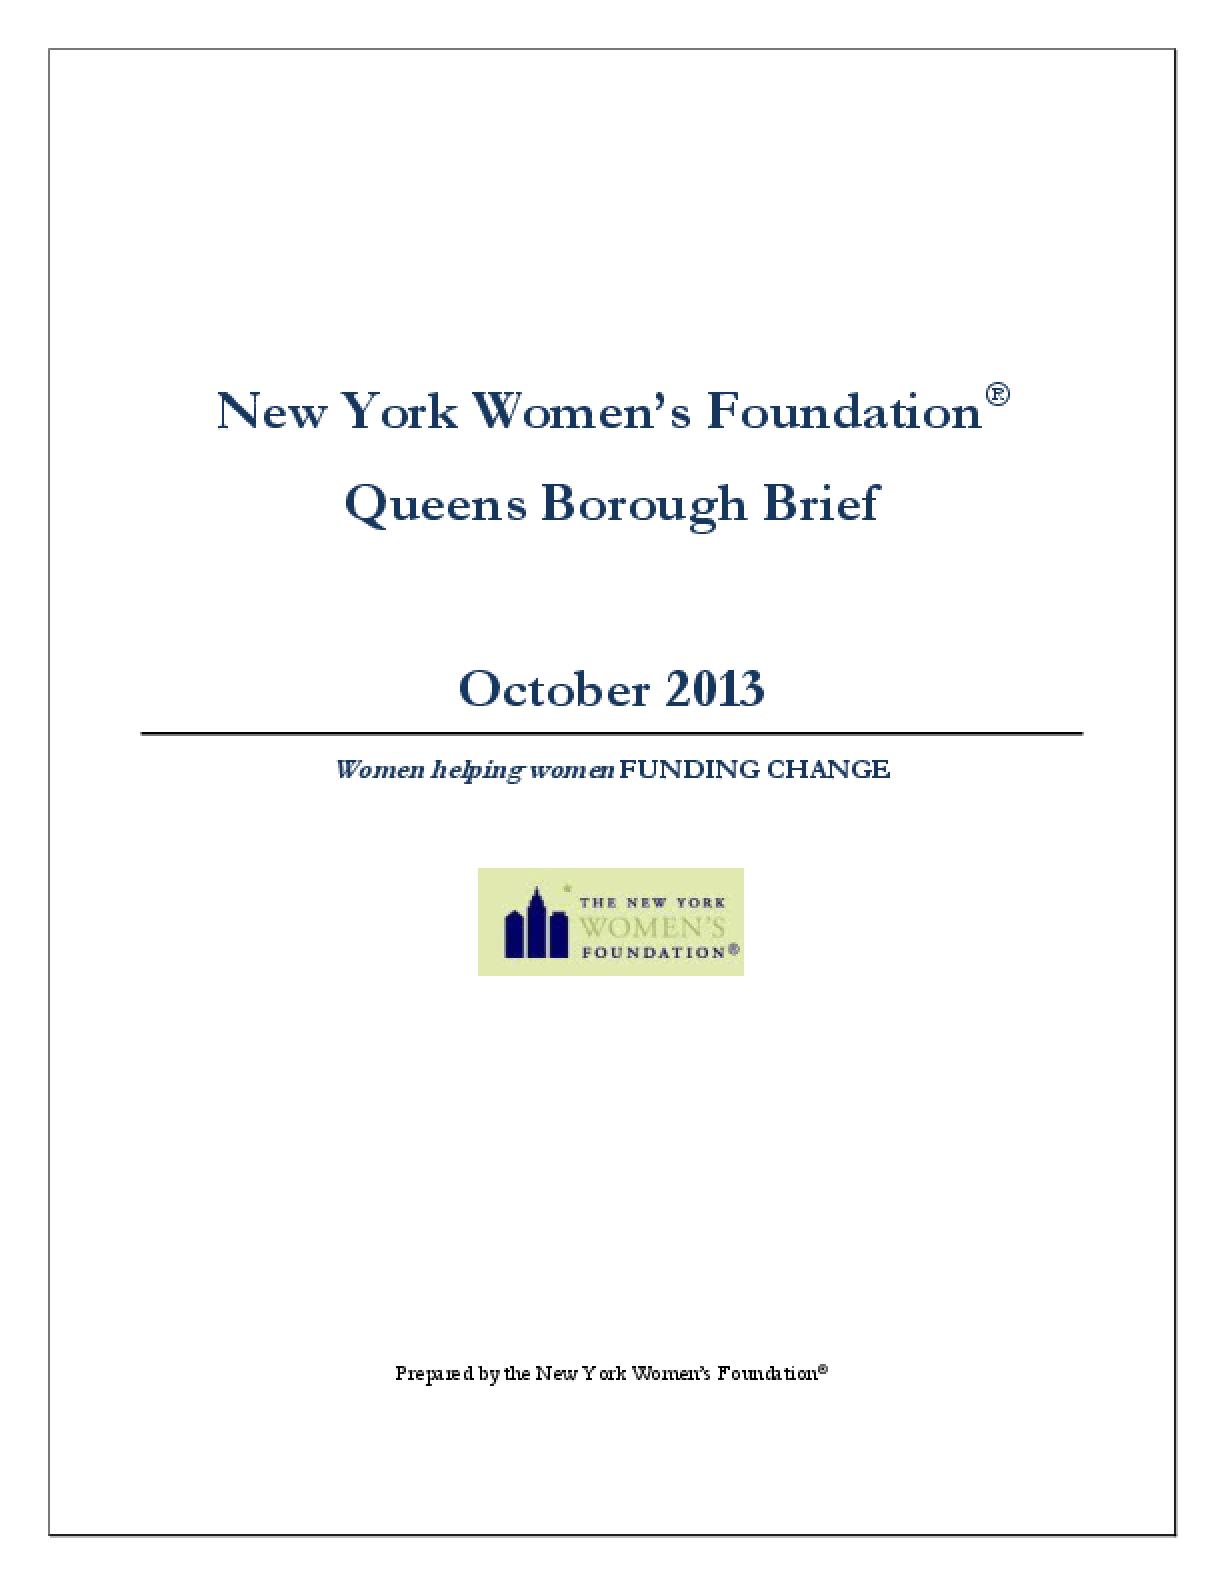 New York Women's Foundation Queens Borough Brief